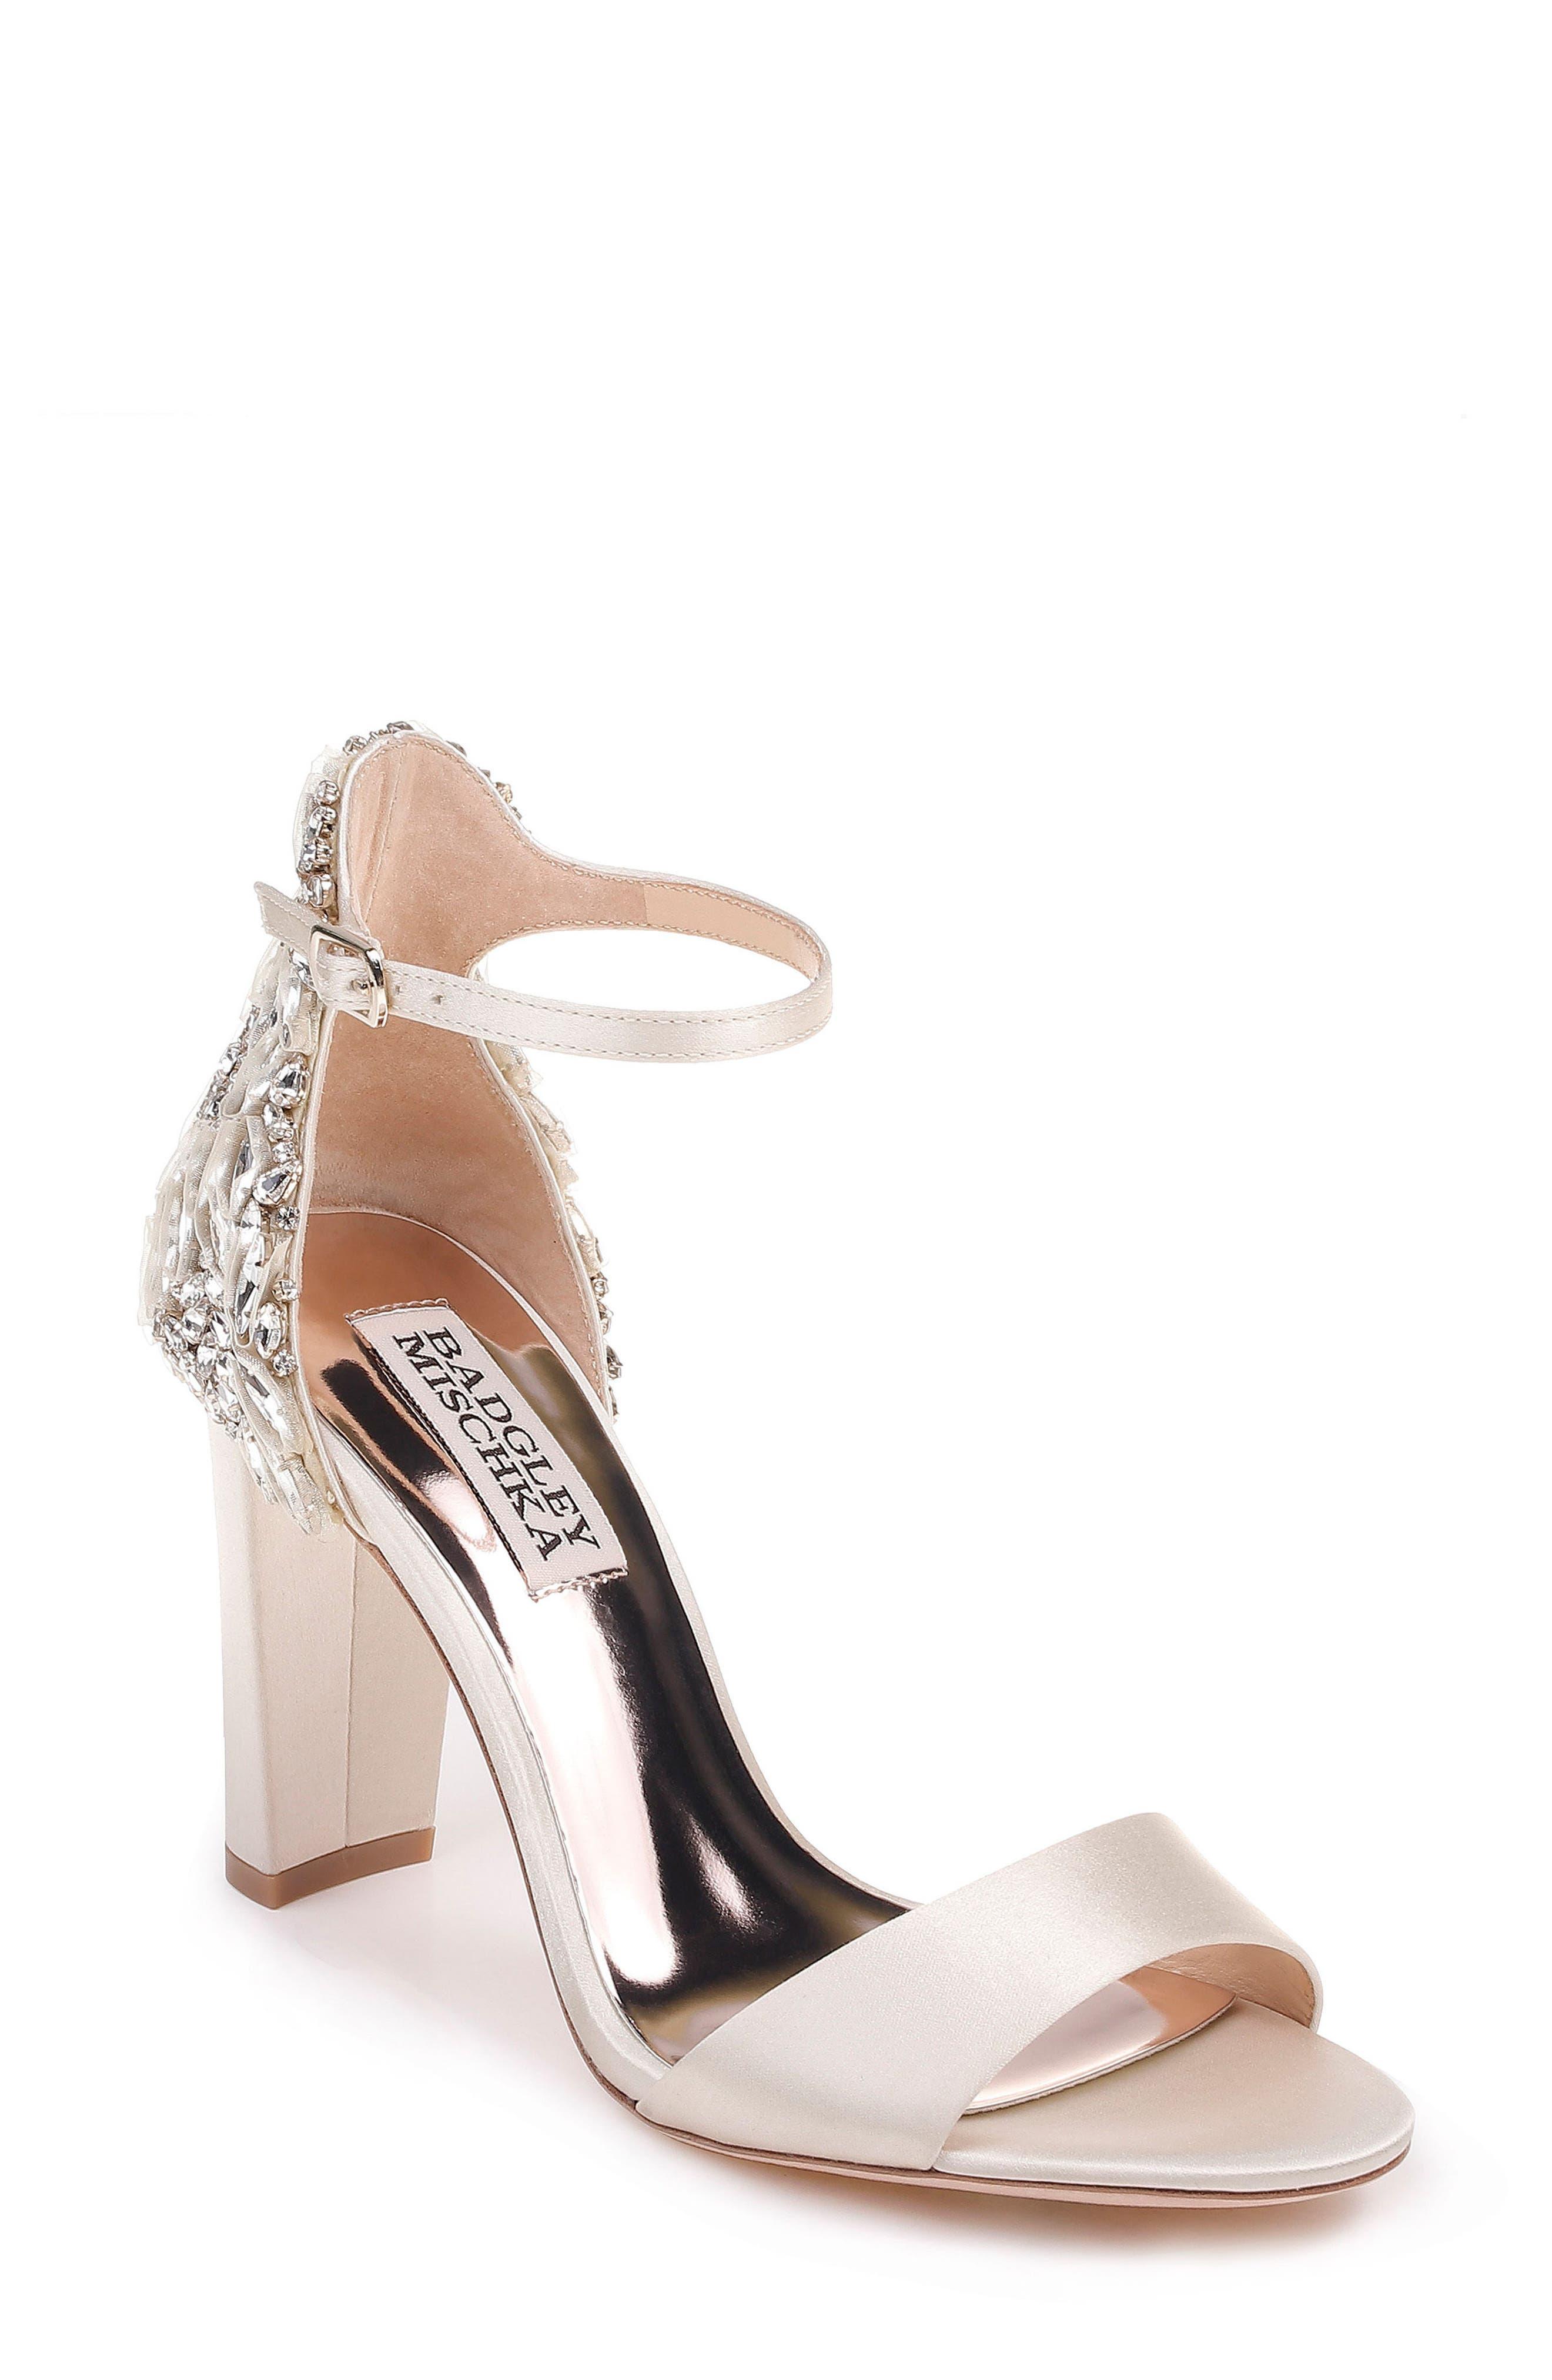 Badgley Mischka Seina Ankle Strap Sandal, Main, color, 100